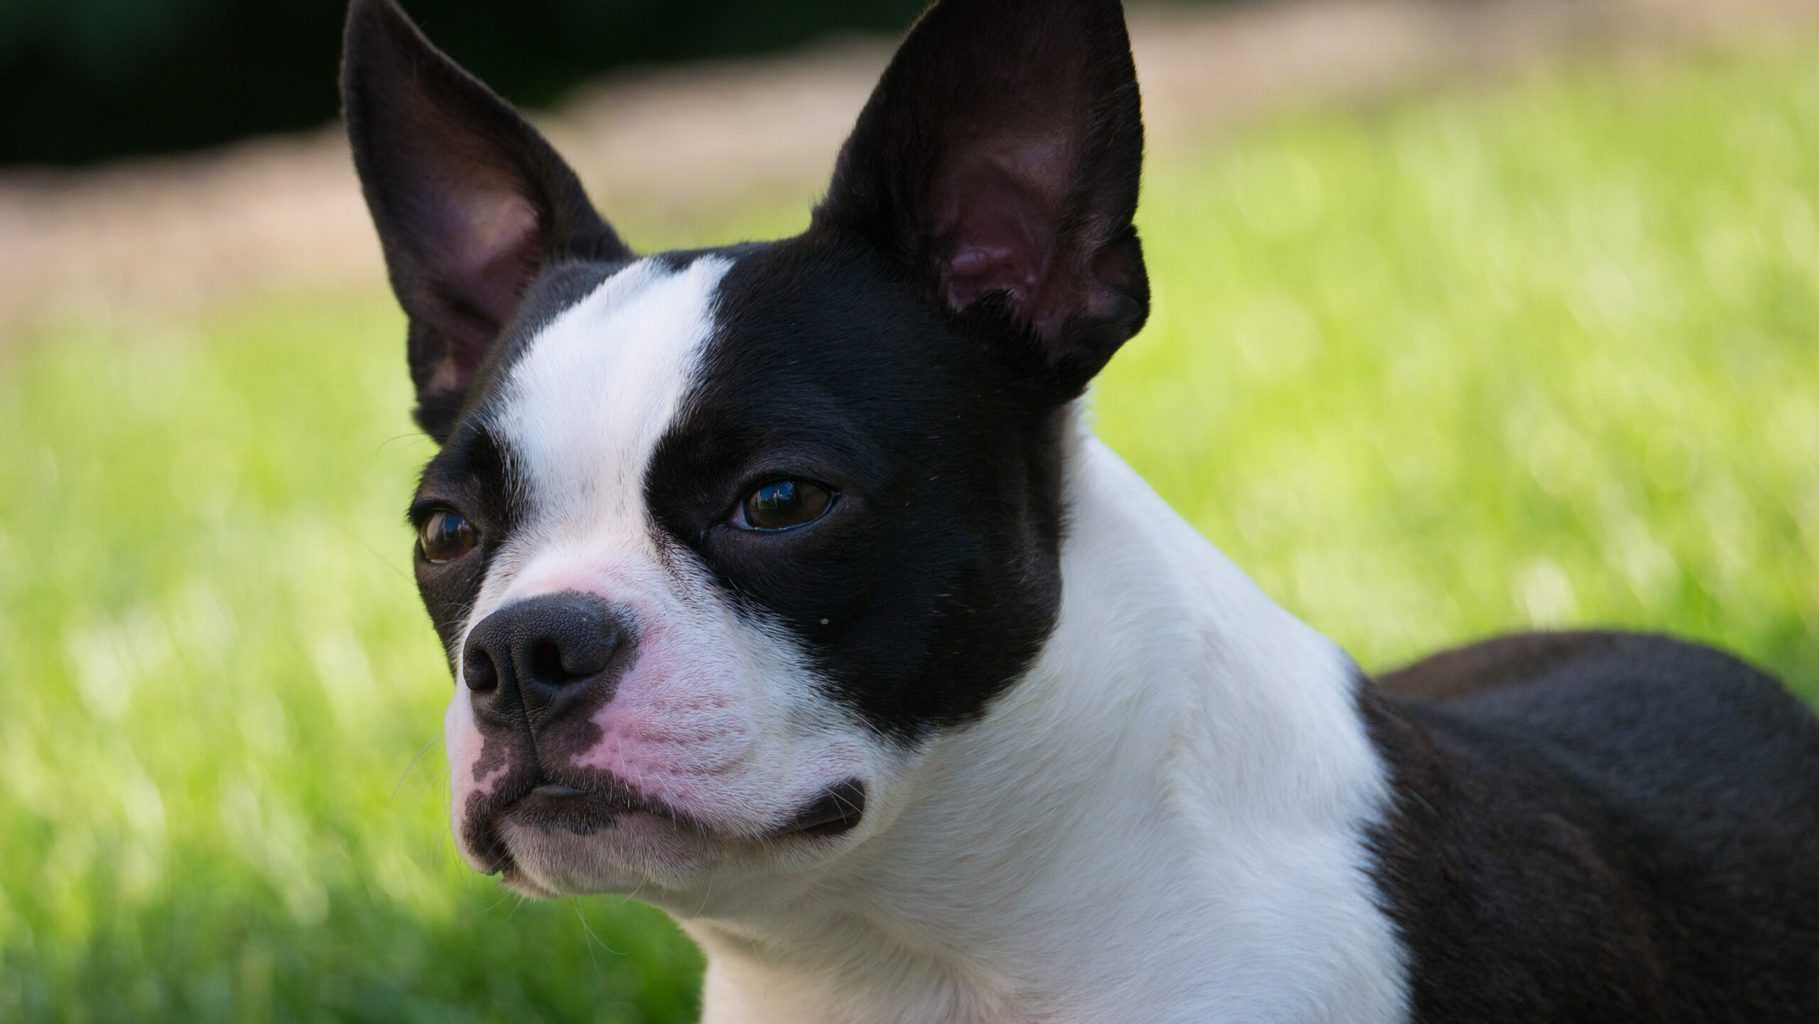 puppy boston terrier side view